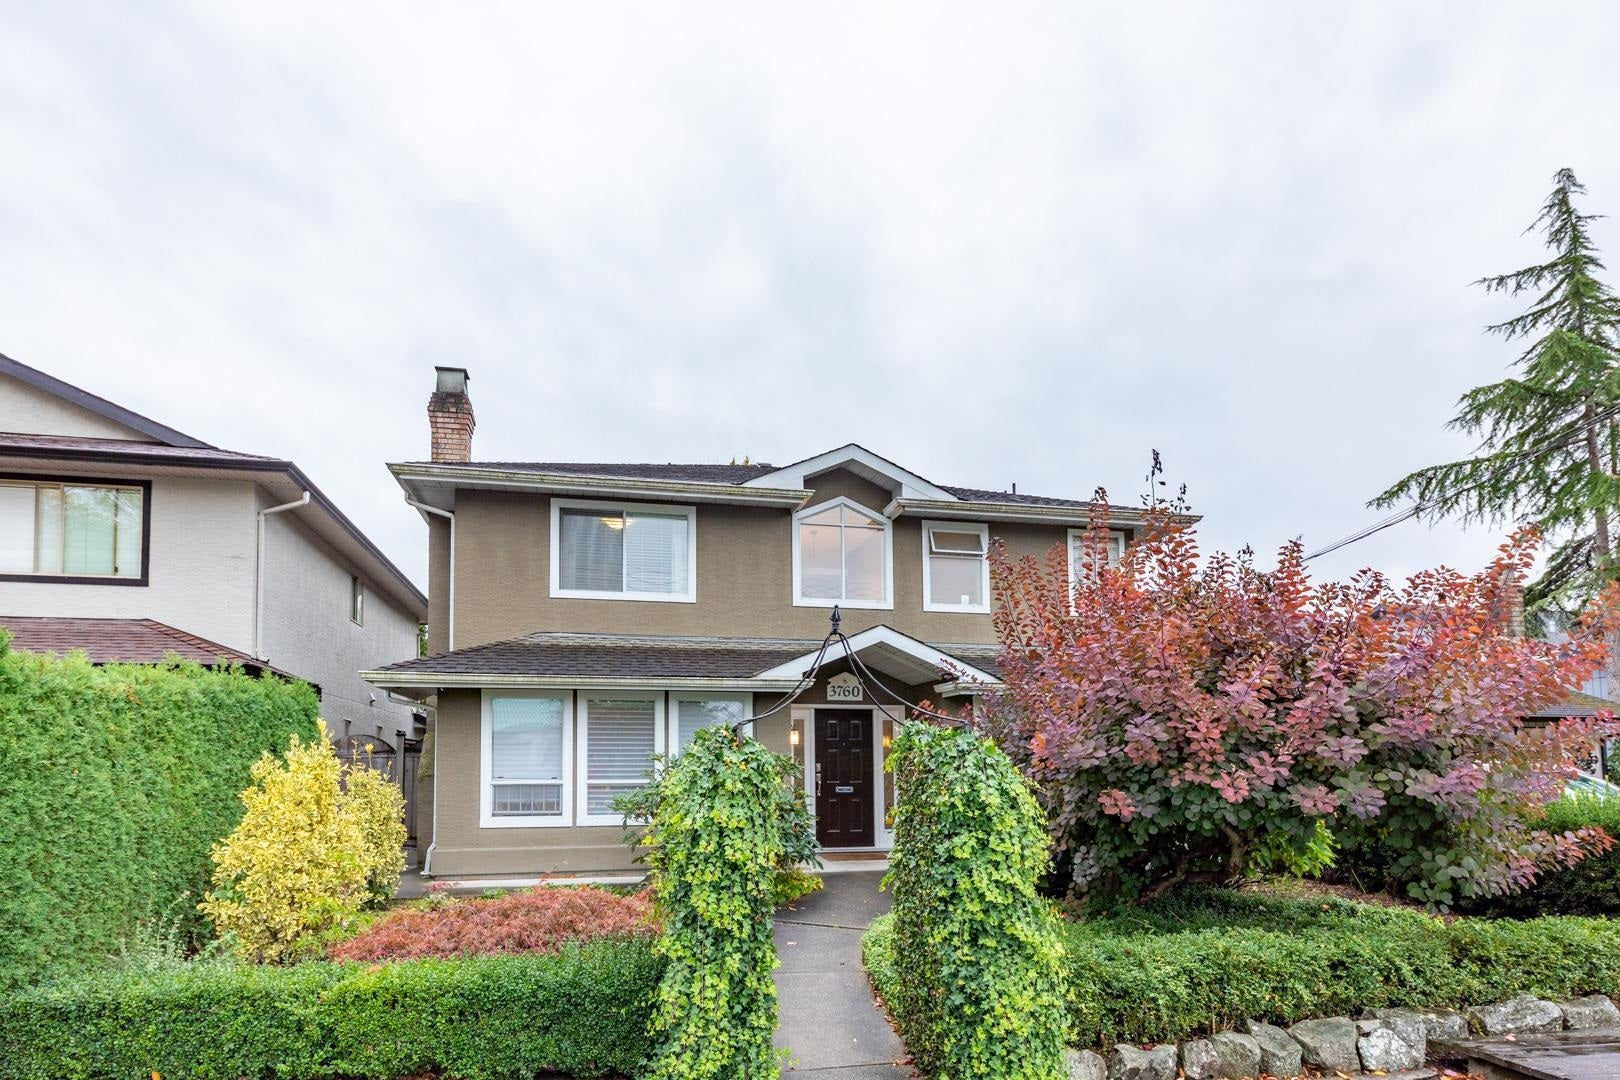 3760 GEORGIA STREET - Steveston Village House/Single Family for sale, 5 Bedrooms (R2623483)